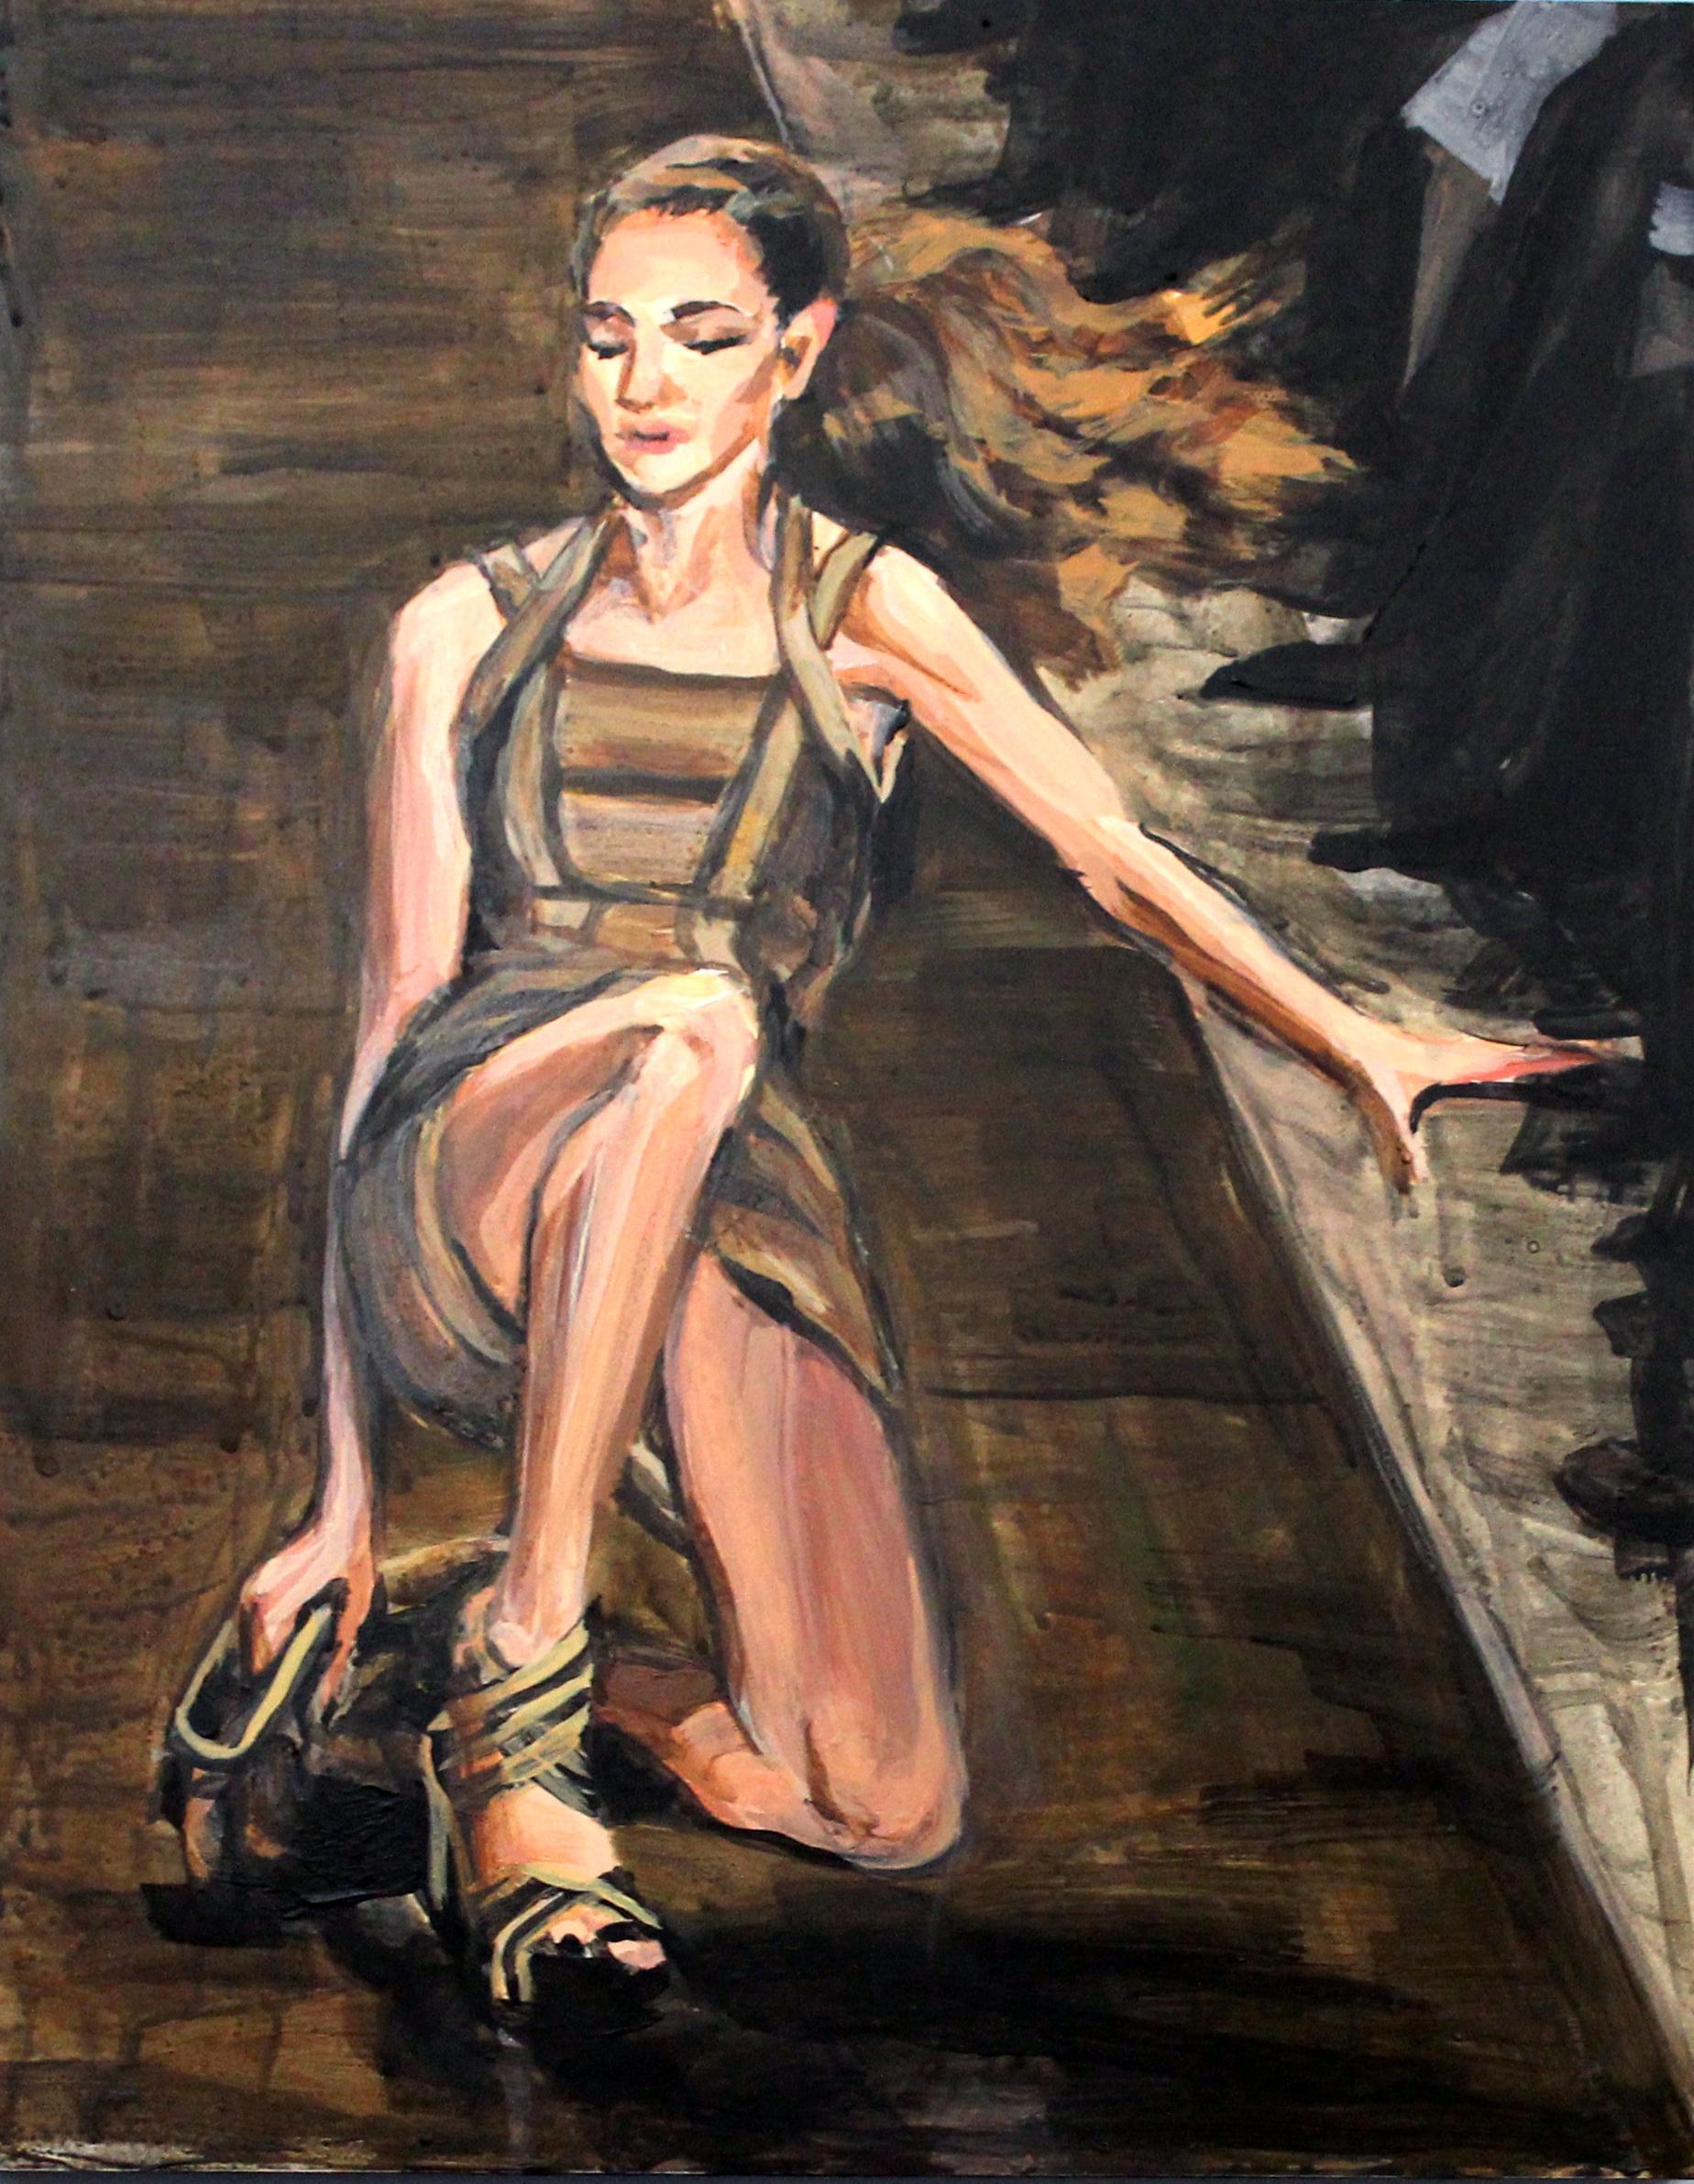 "Runway Model Falling no.6 (Monika Jagaciak during Herve Leger)   11"" x 14"" acrylic on panel"